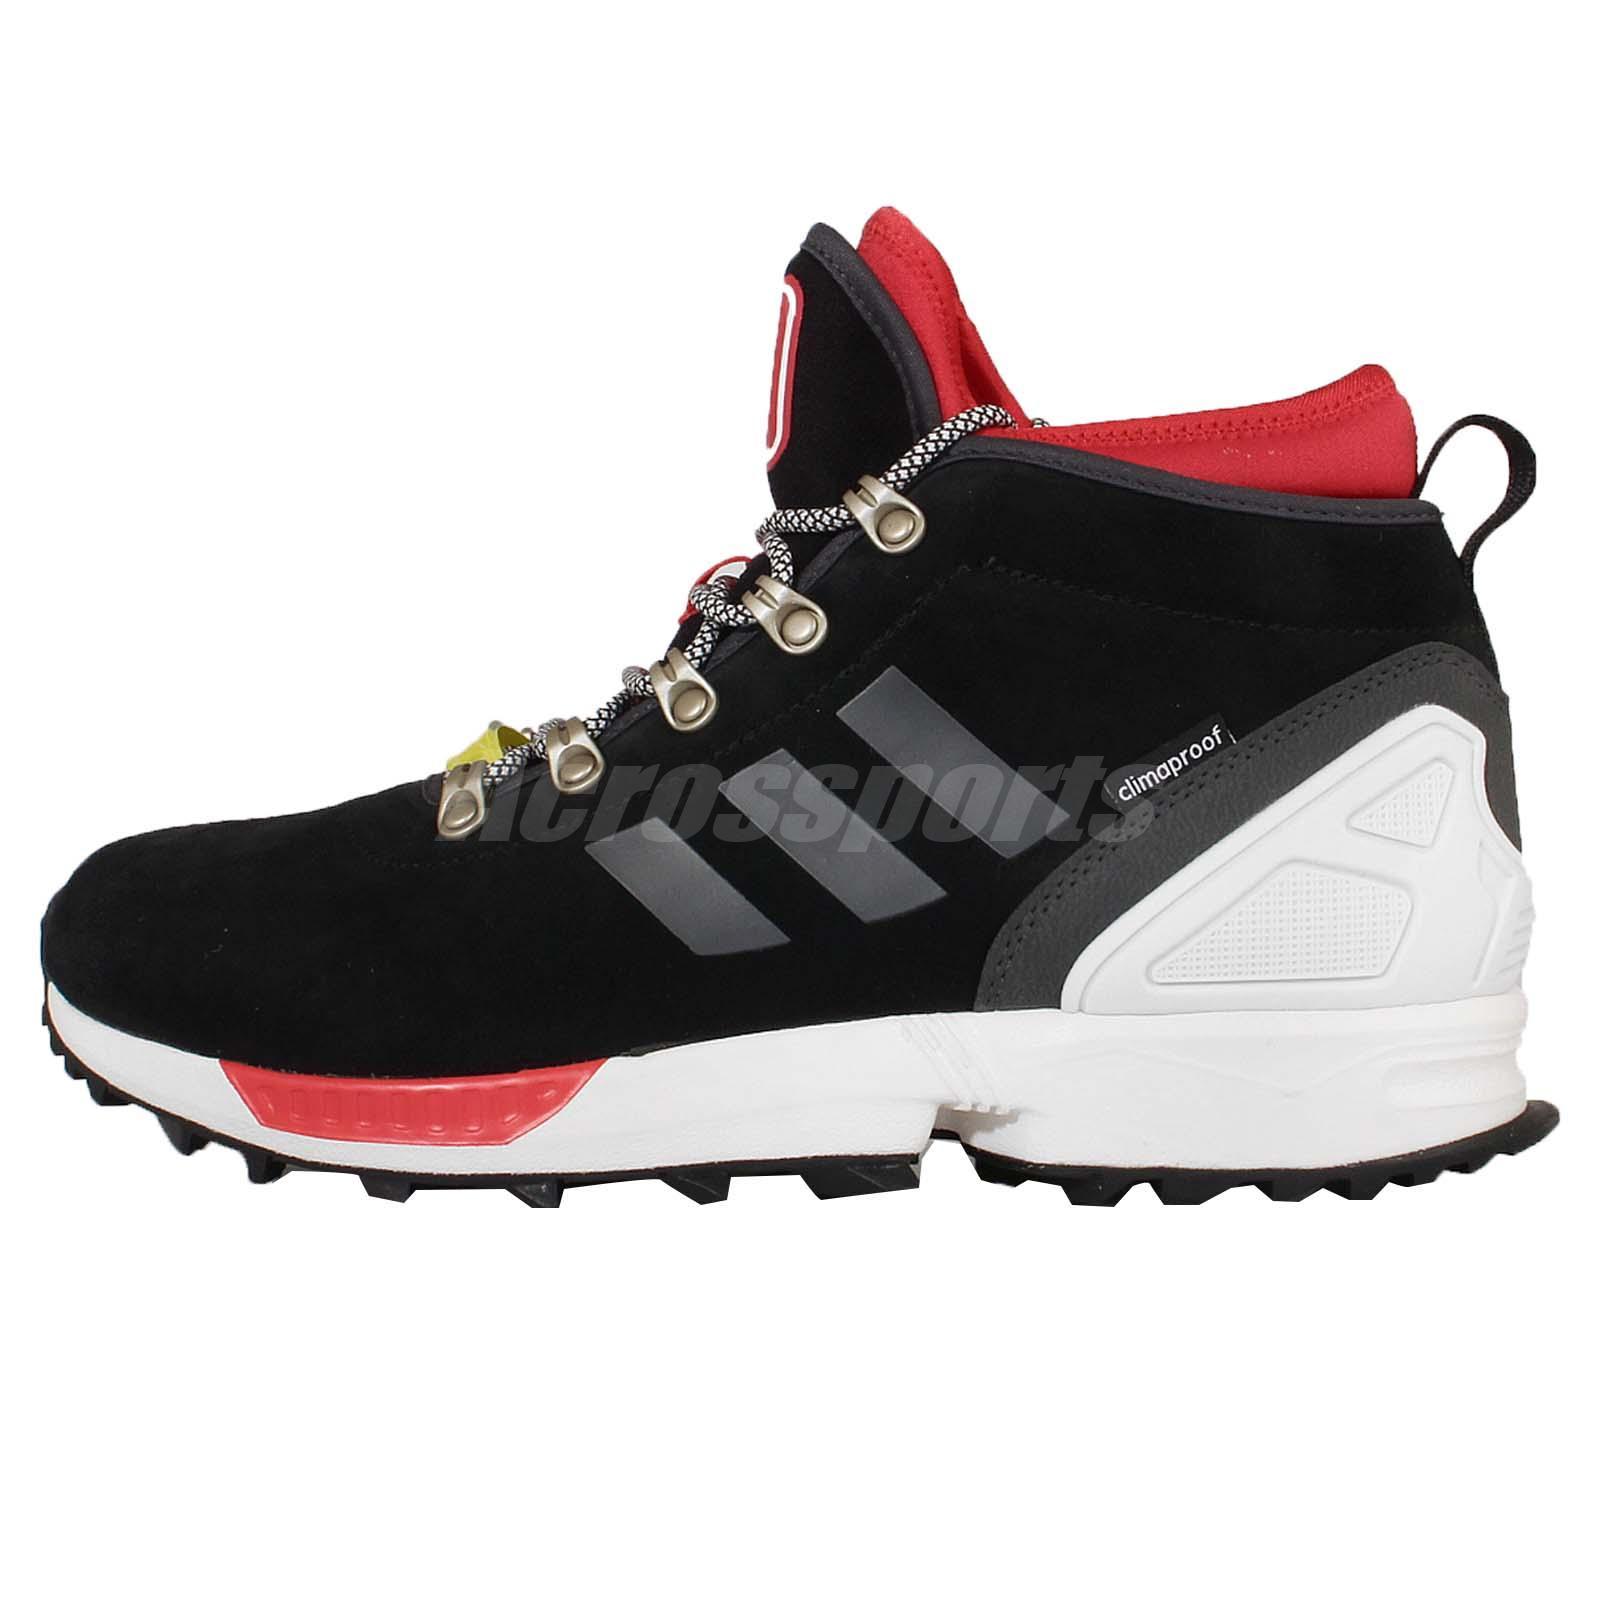 adidas originals zx flux winter black red mens running. Black Bedroom Furniture Sets. Home Design Ideas